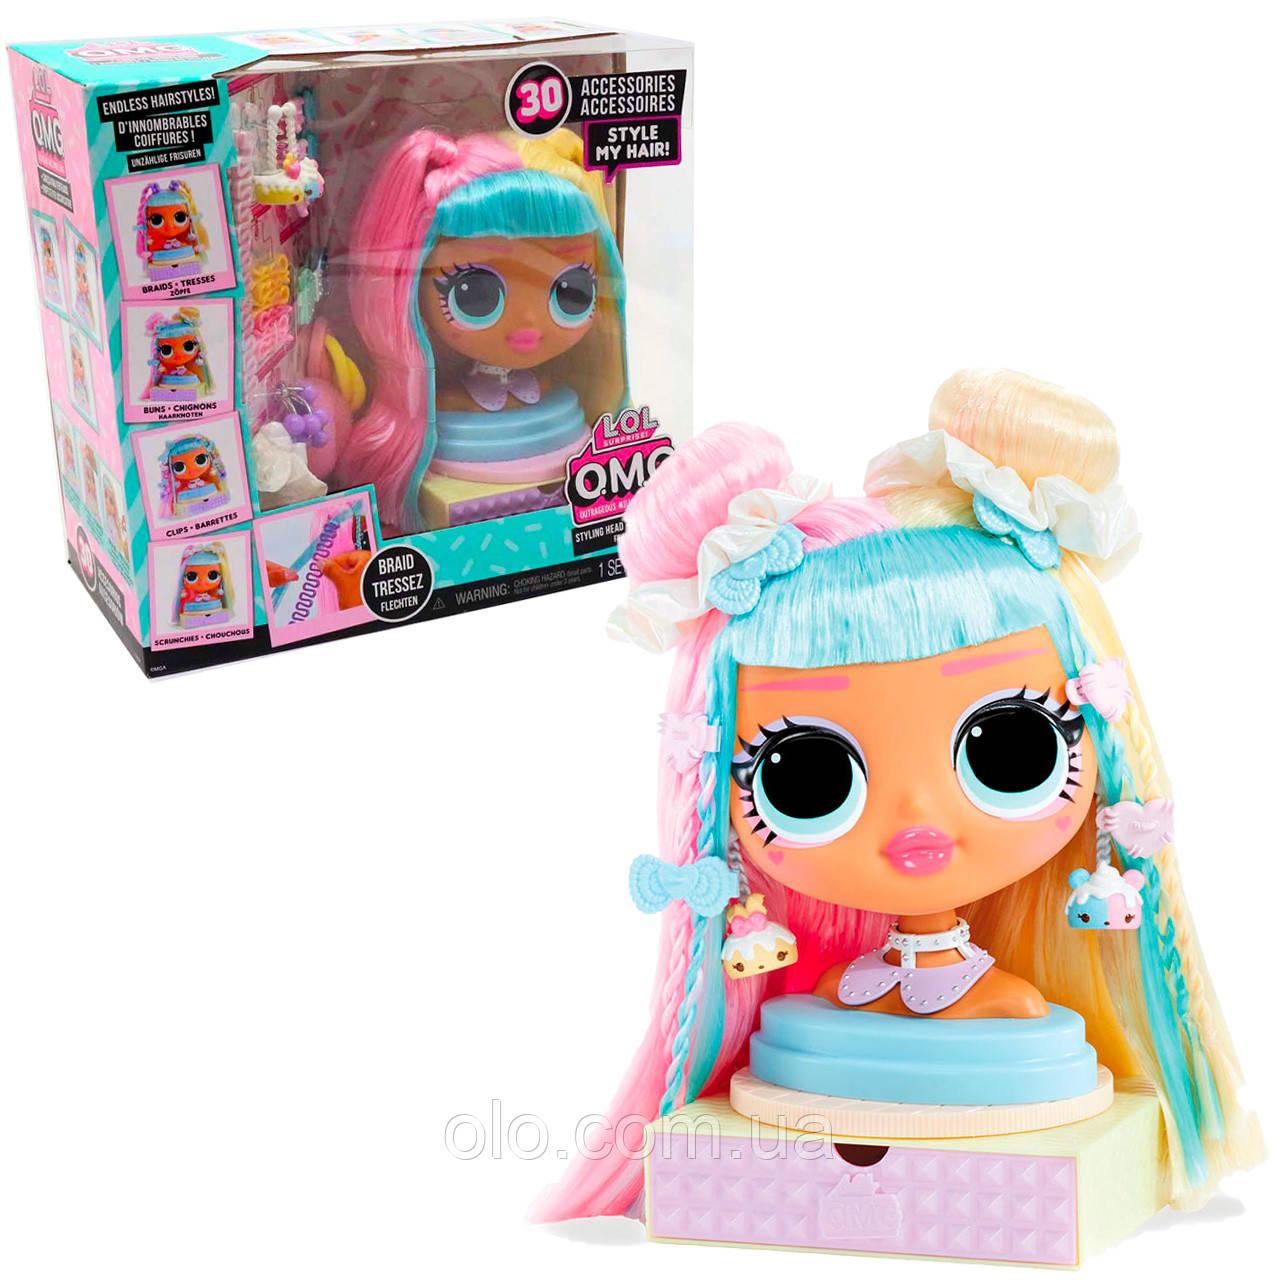 Лялька-манекен LOL Surprise! серії OMG «Леді Бон-Бон», 22 * 13 * 10 см (572008)